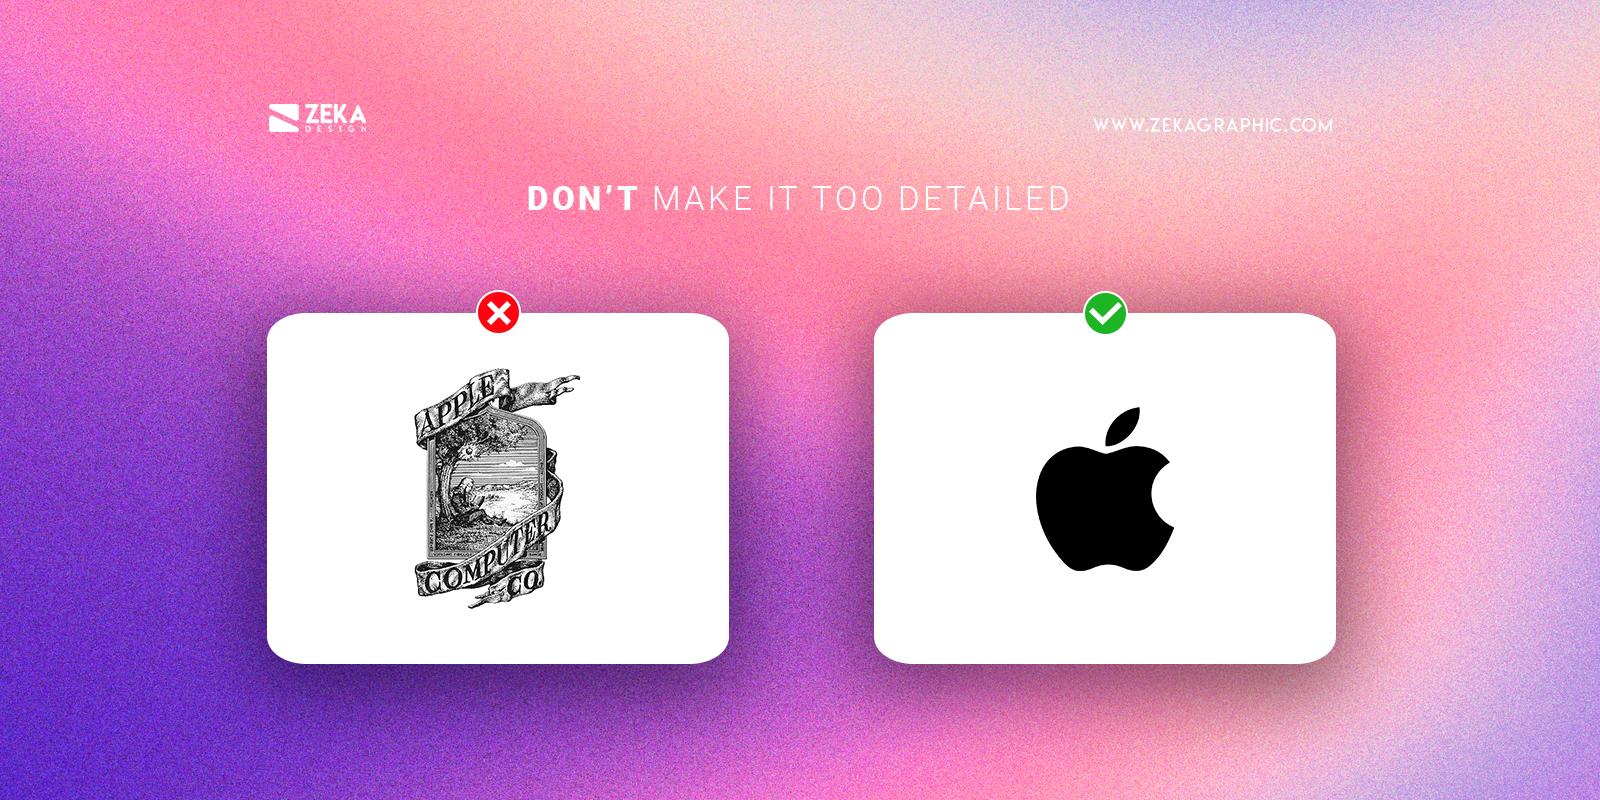 Donts Logo Design Tips Make it too detailed